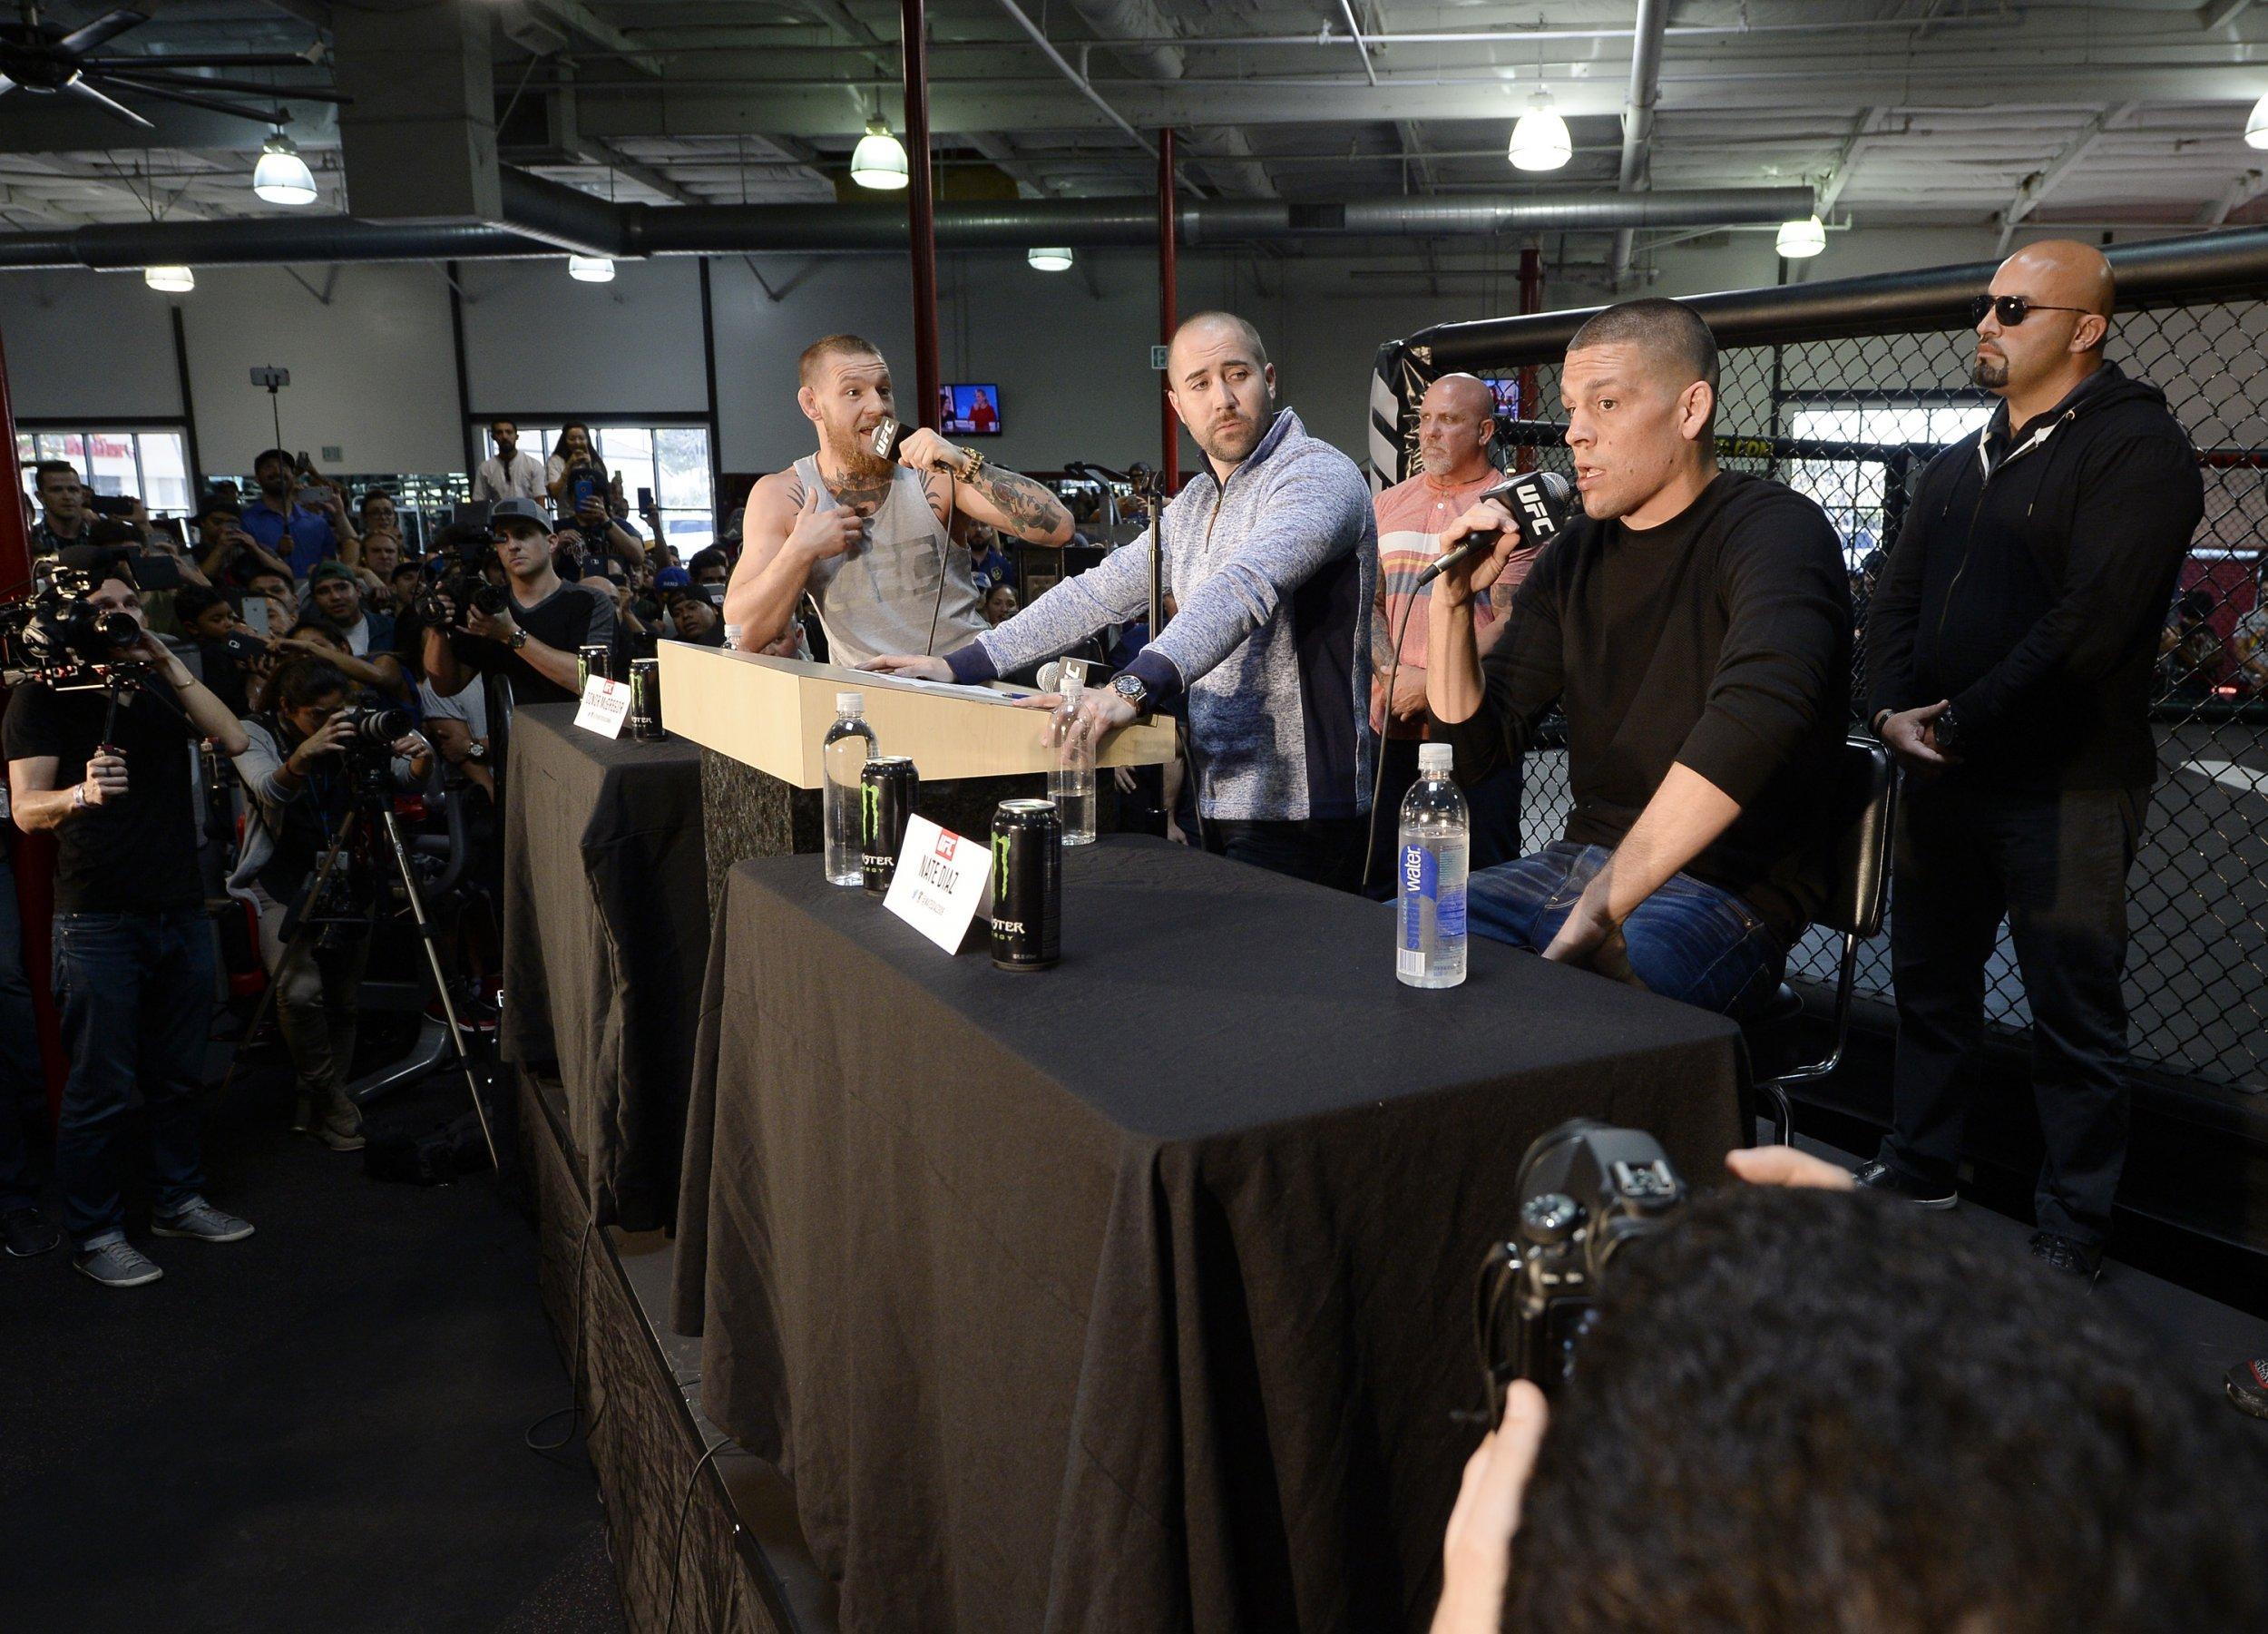 Conor McGregor, far left, with Nate Diaz, far right.